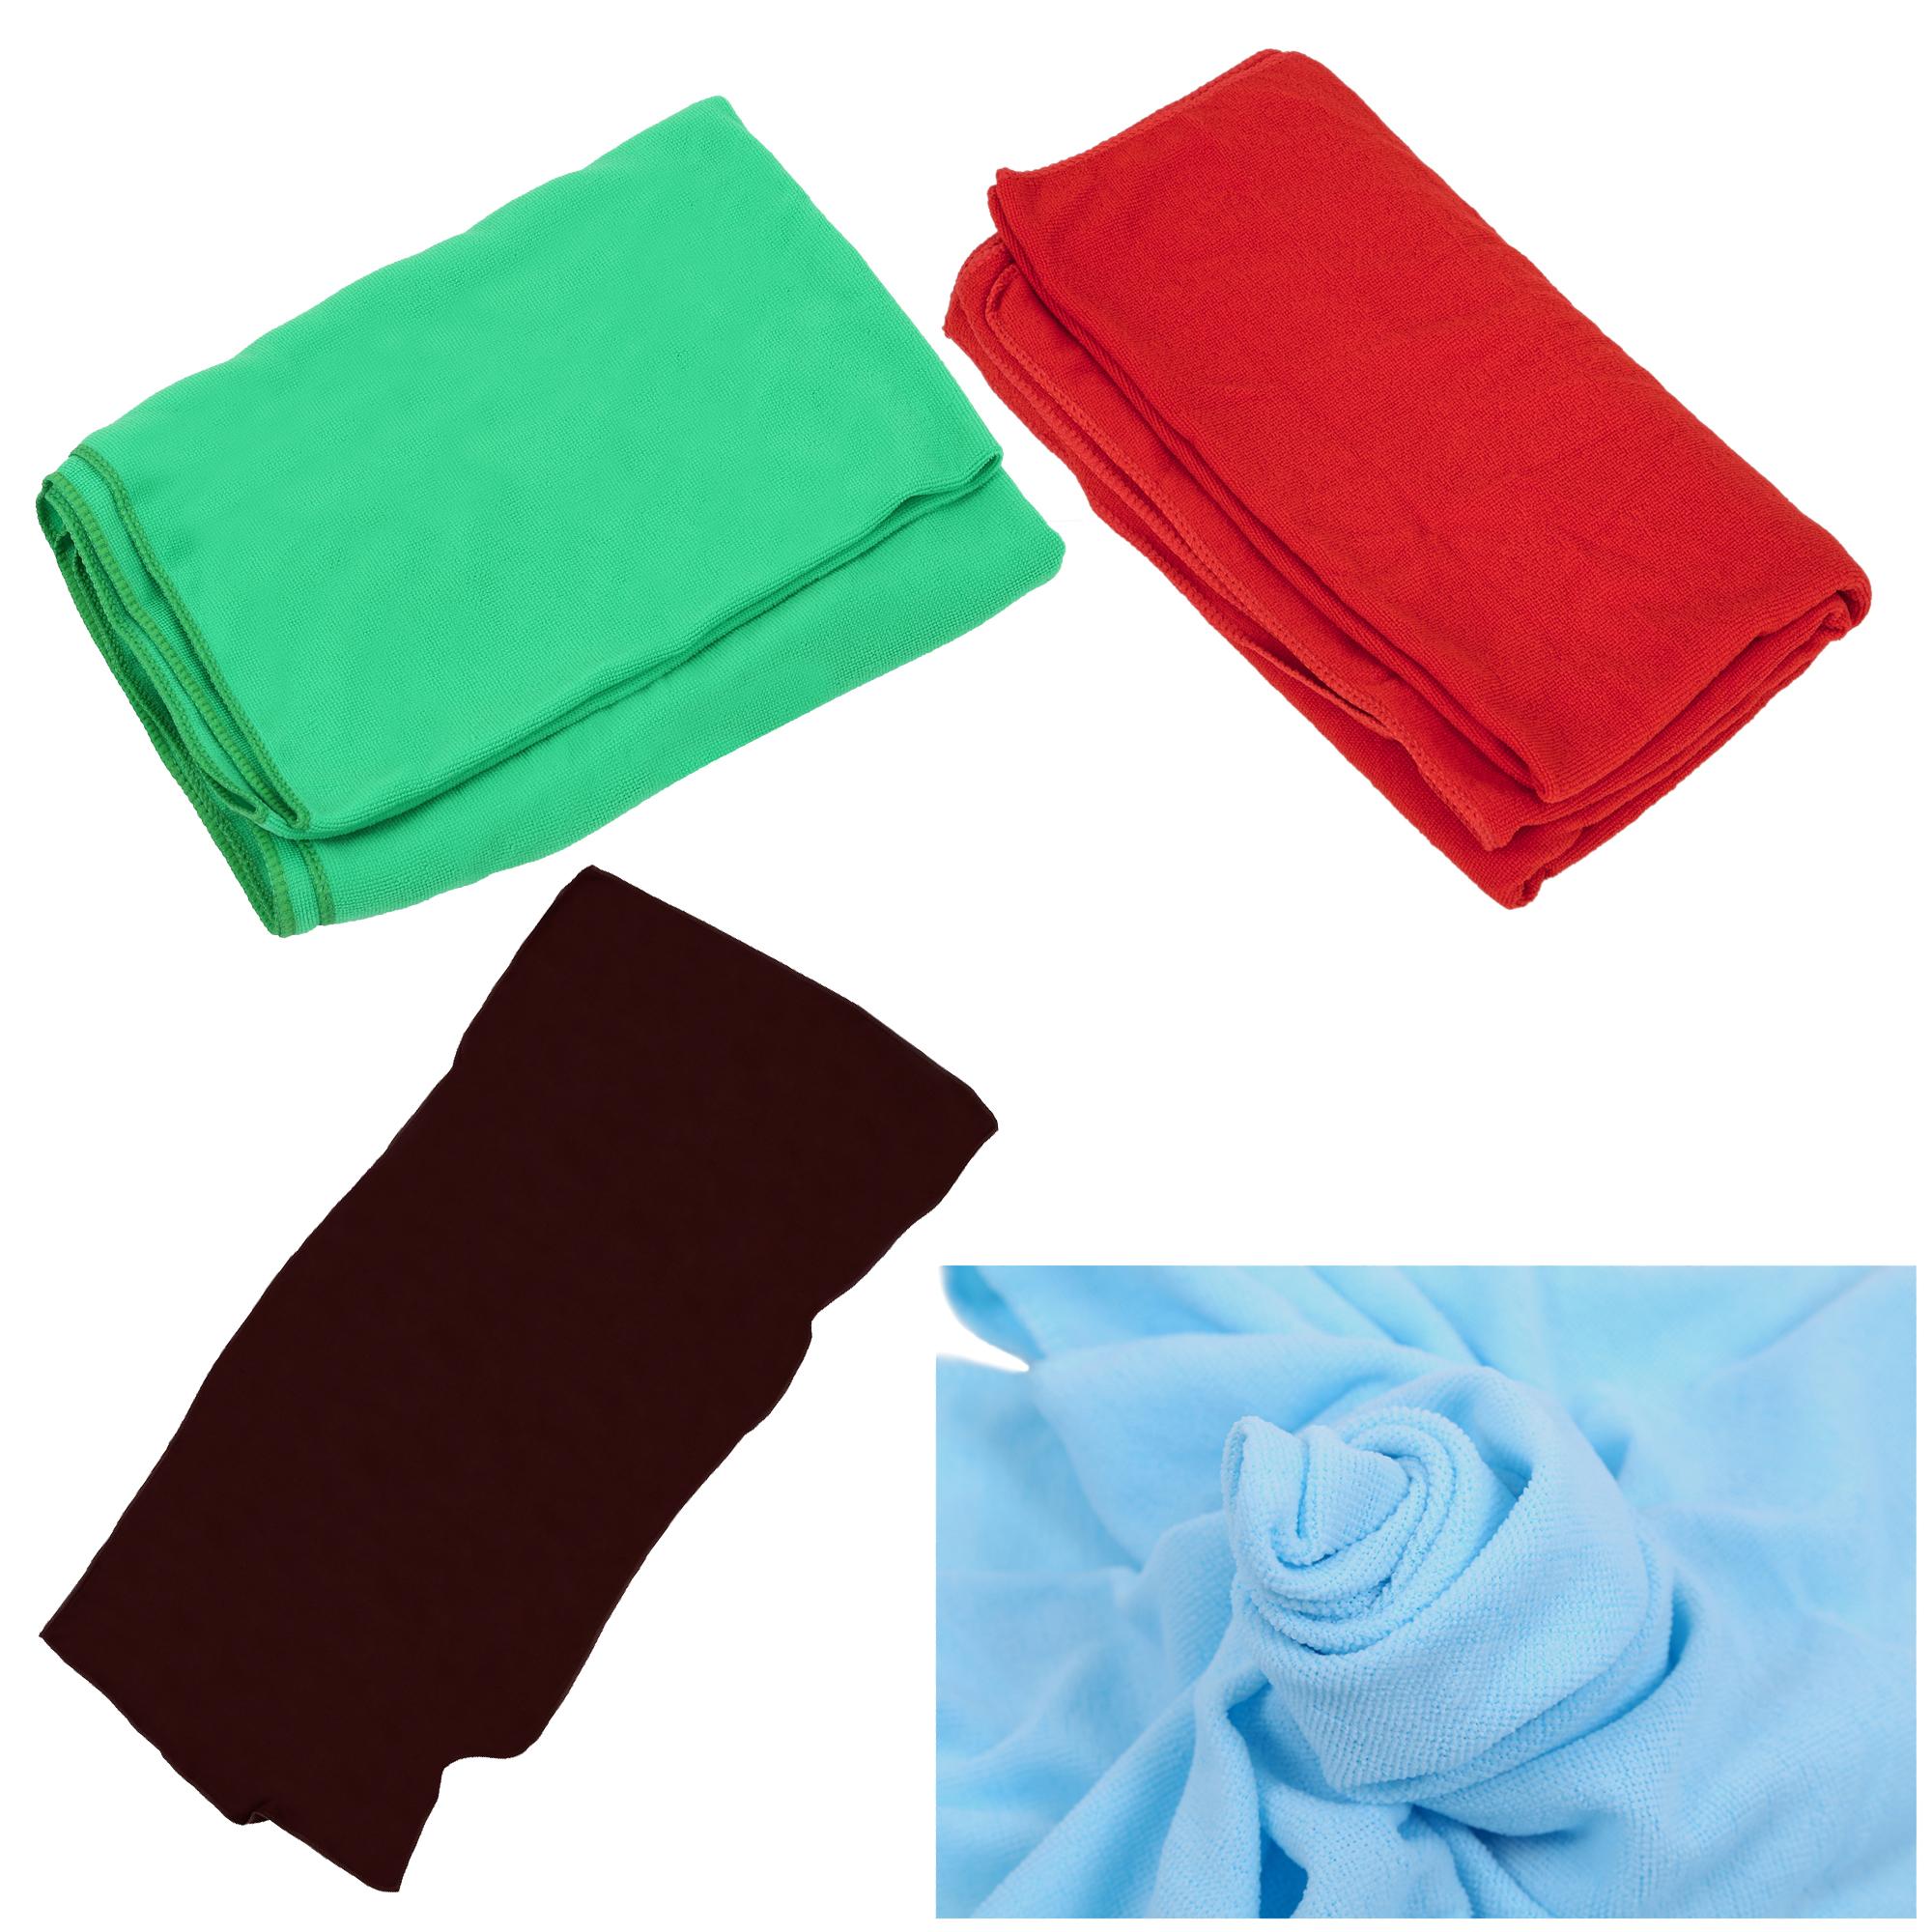 Red Towels Bathroom: Microfiber Beach Bath Towels Travel Dry Towels Red F8T9